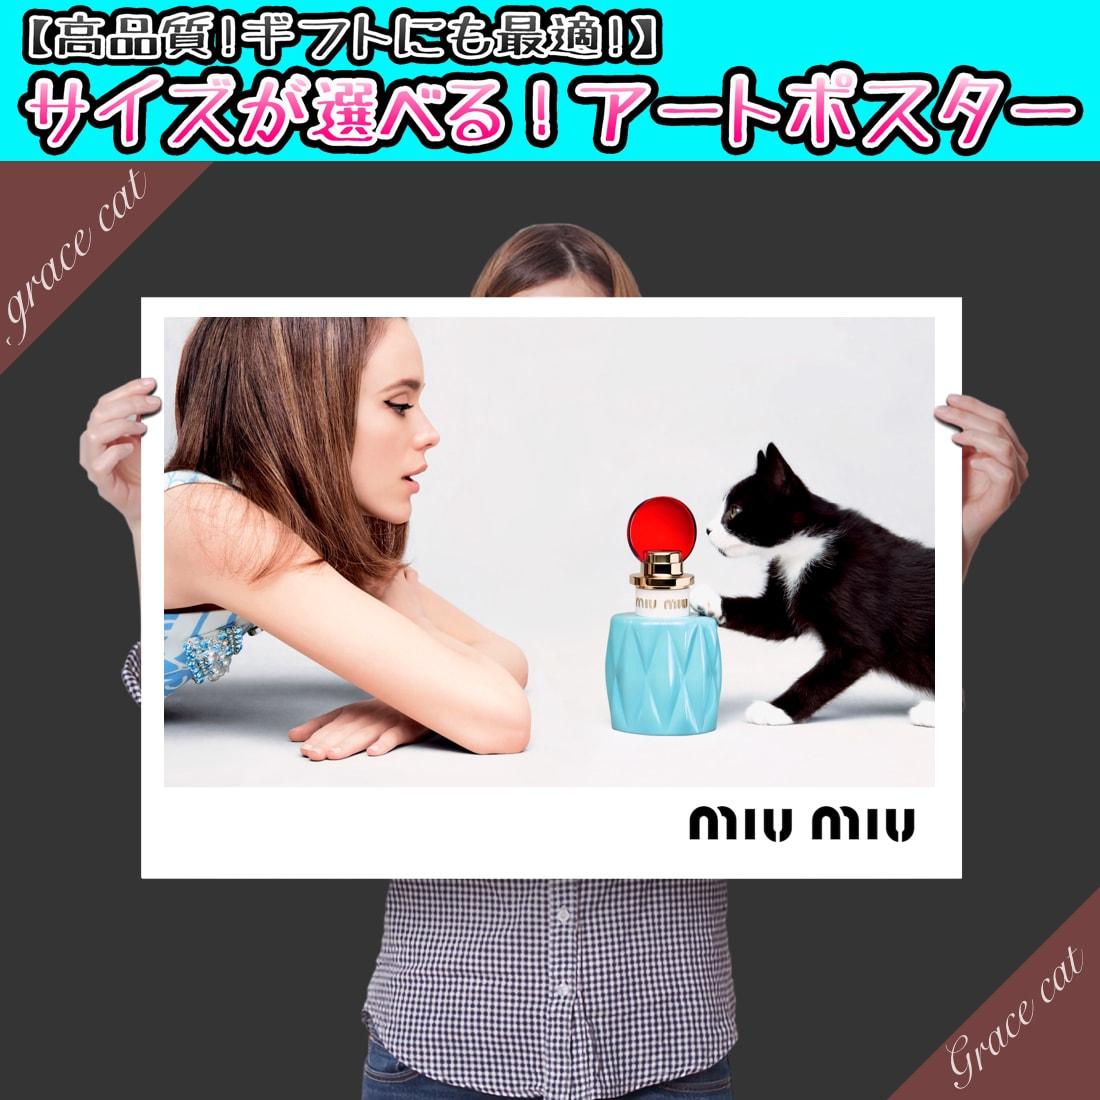 【 Grace cat Art 】サイズが選べるアートポスター / アートパネル / キャンバスパネル アート / グラフィック アート / インテリア アート / パロディアート / ギフト 【 オマージュモチーフ:MIU MIU / ミュウミュウ 】